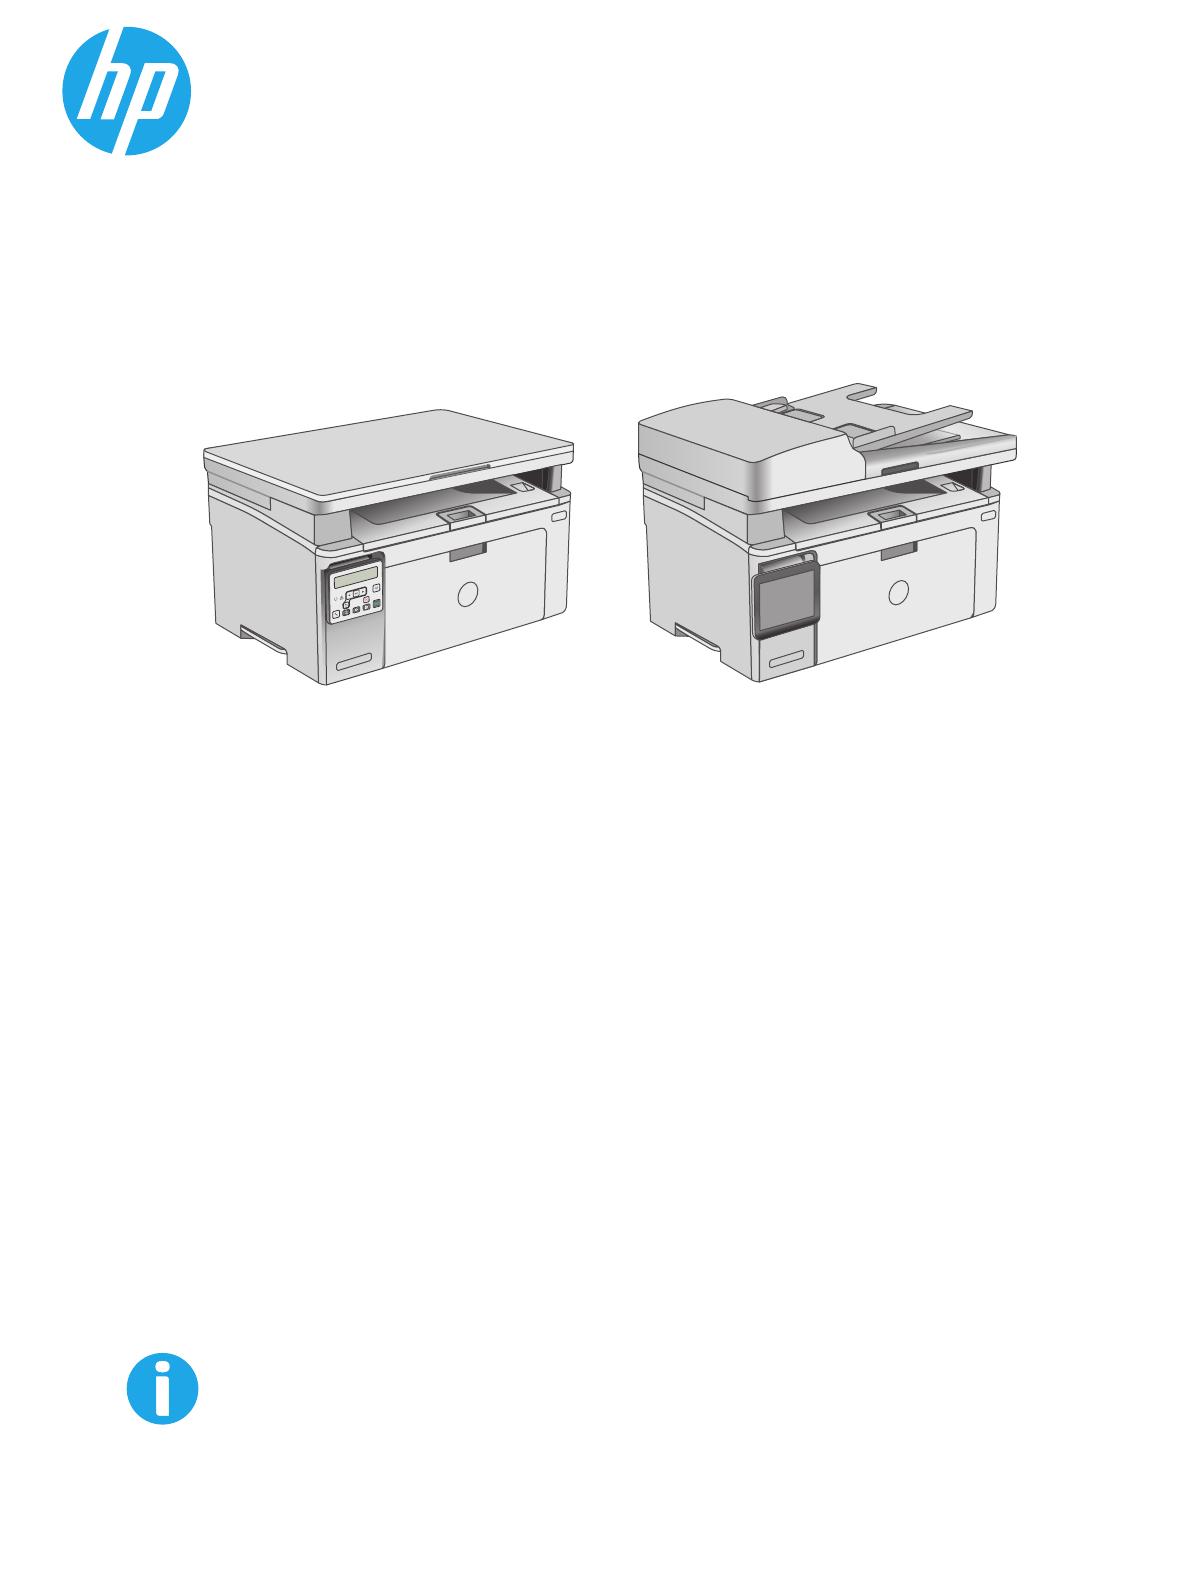 HP LaserJet Pro MFP M130a manual